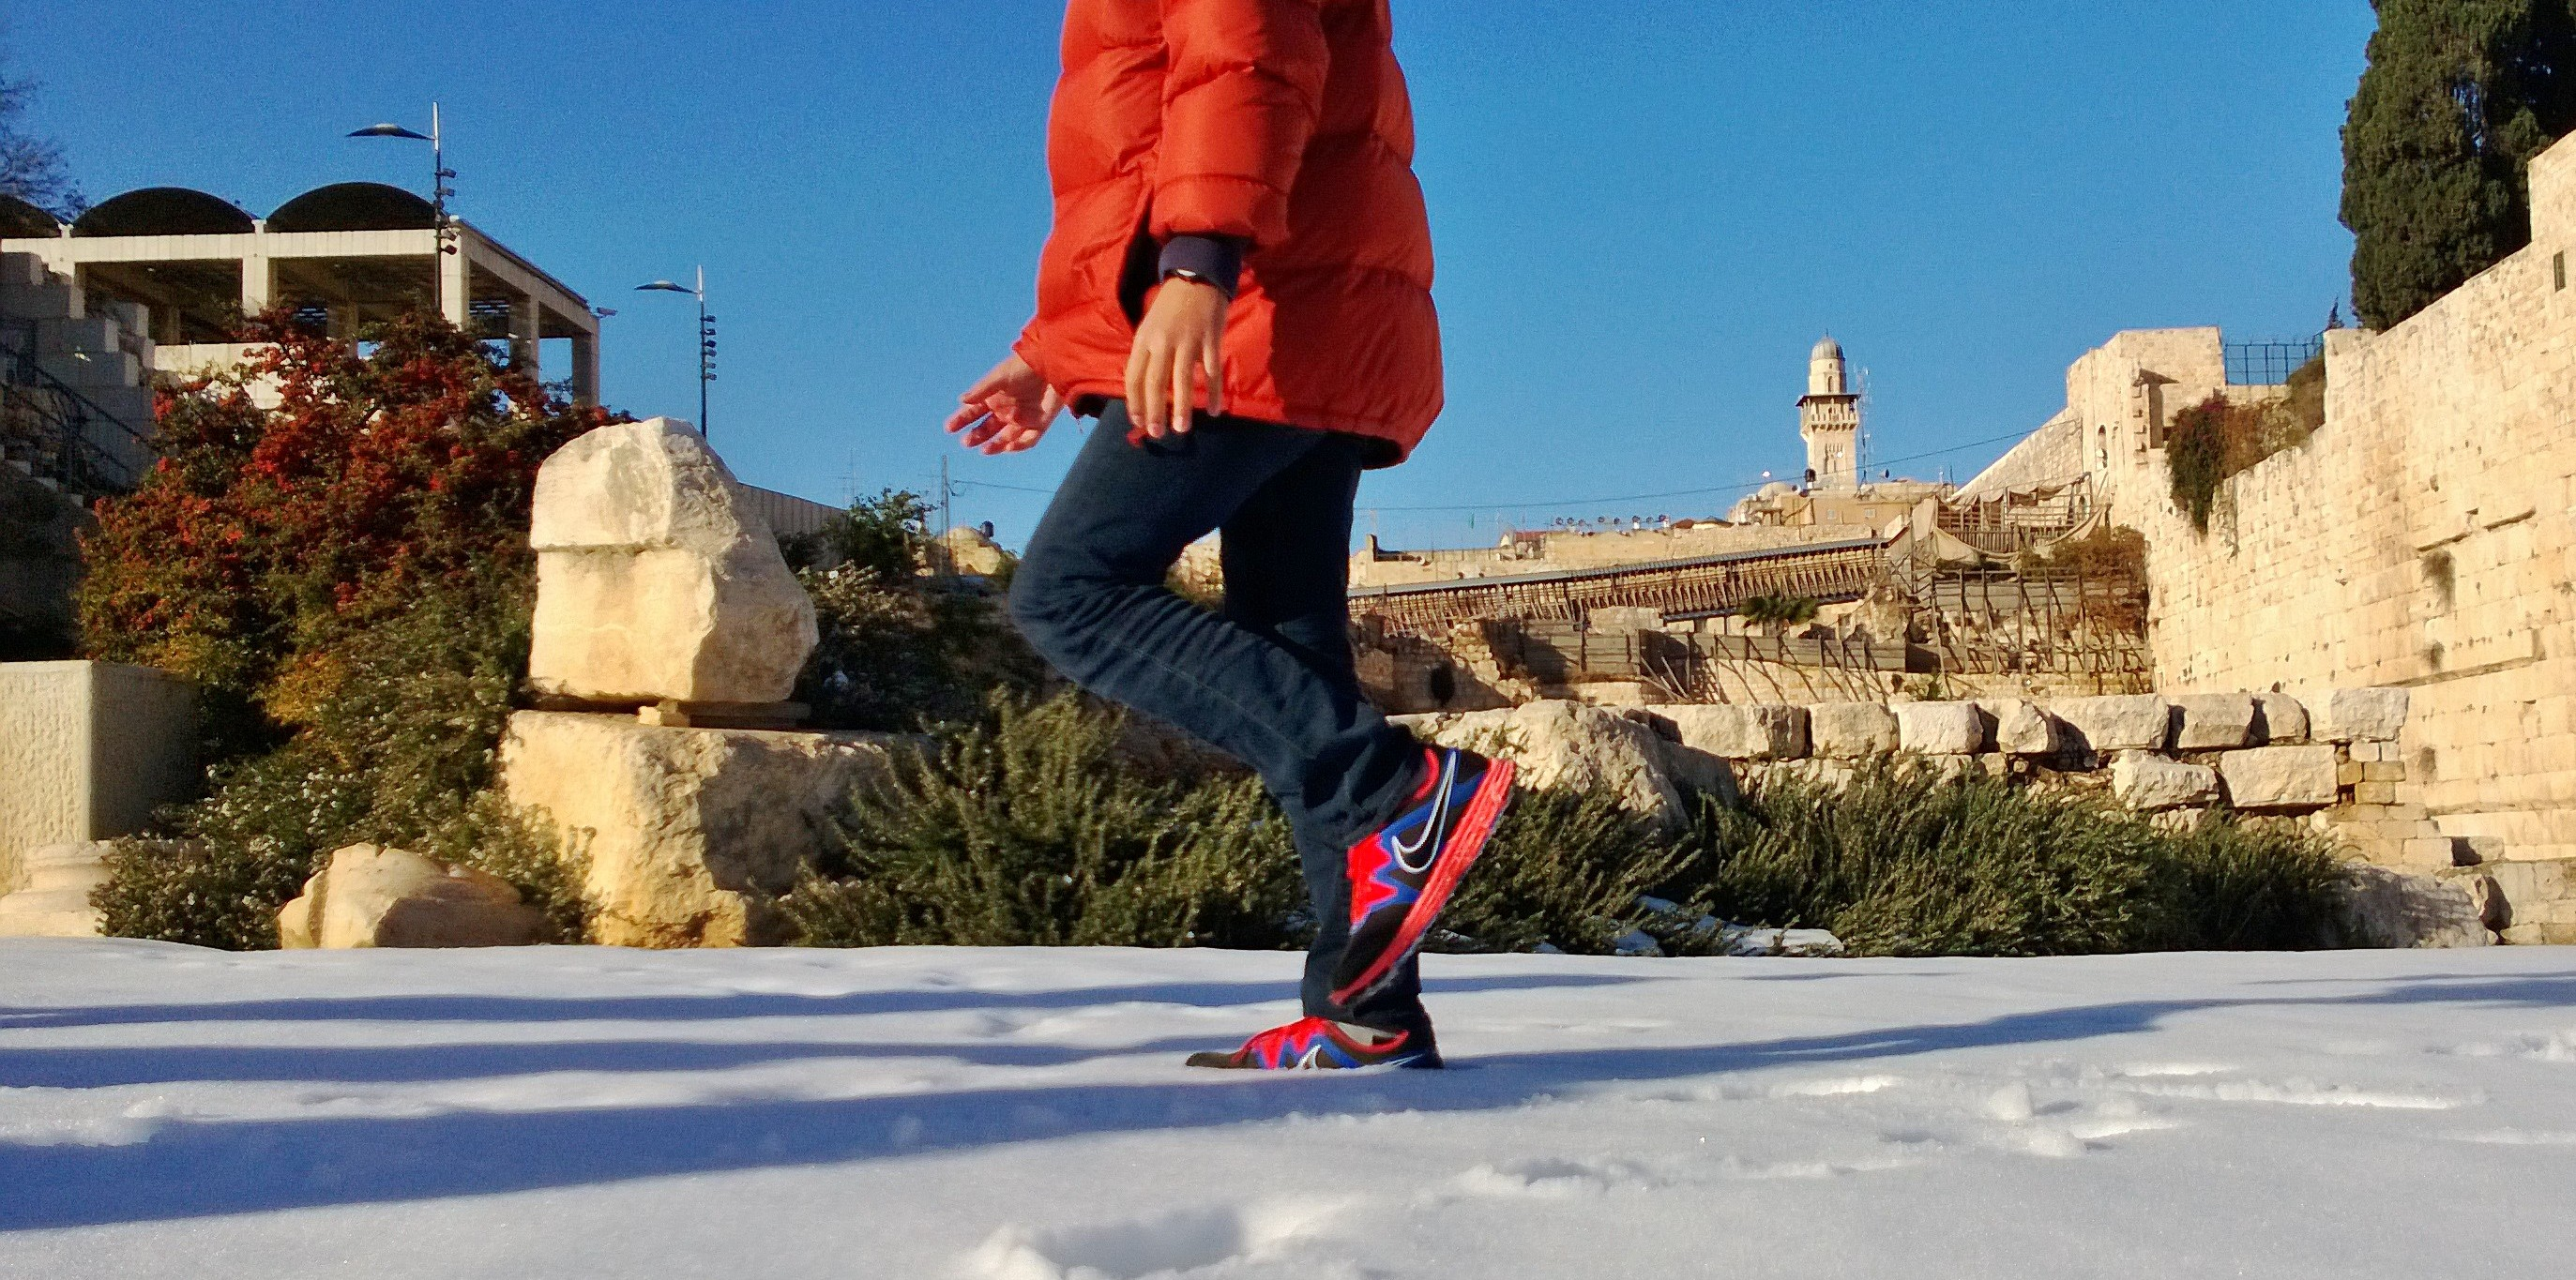 Jerusalem snowed under